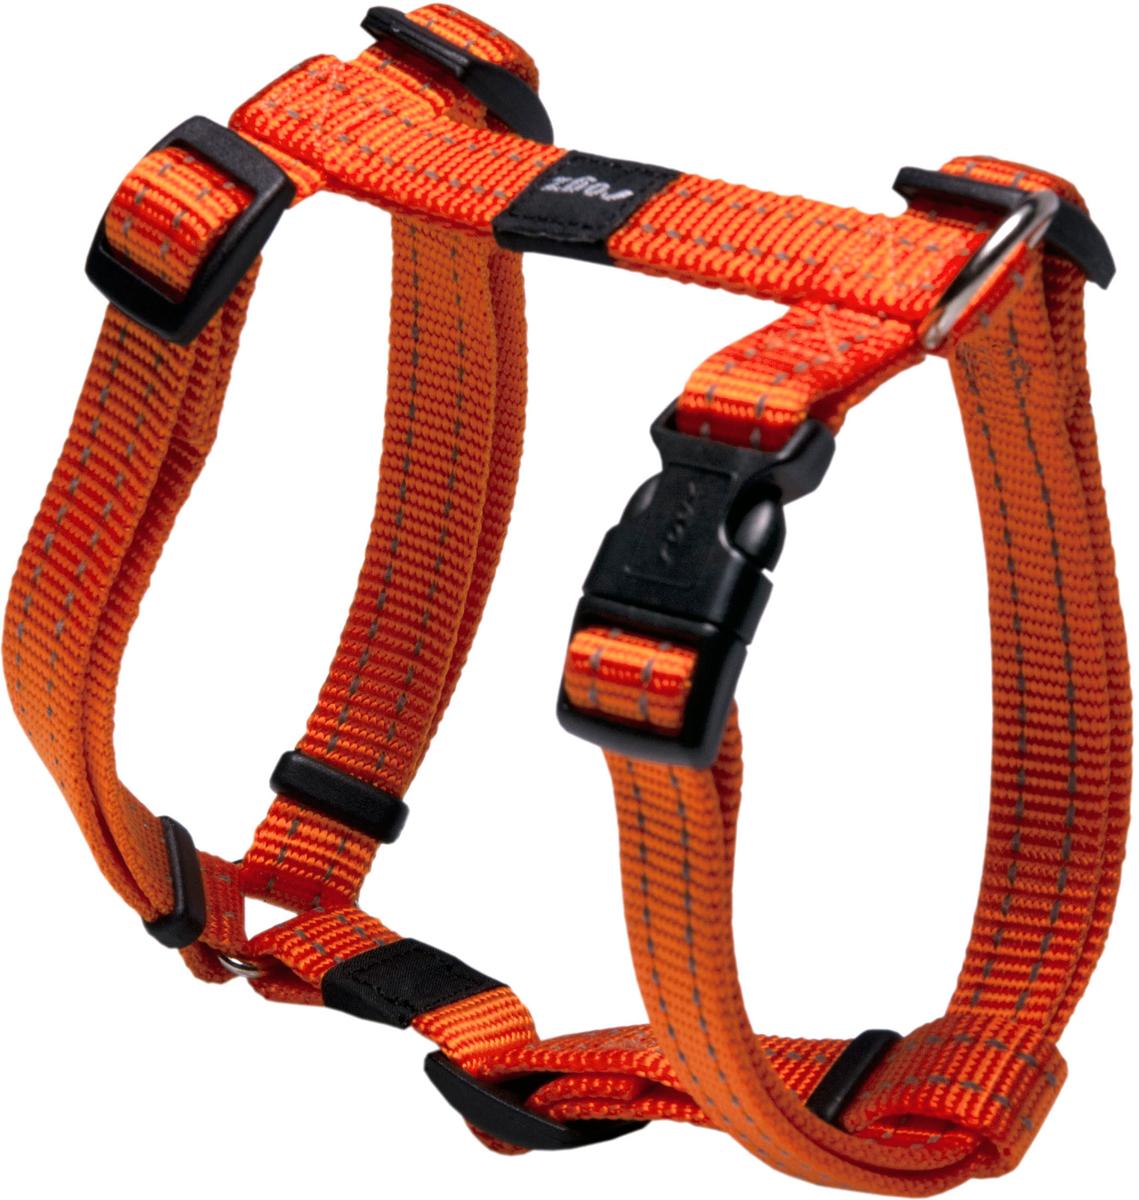 Шлейка для собак Rogz  Utility , цвет: оранжевый, ширина 1,6 см. Размер M